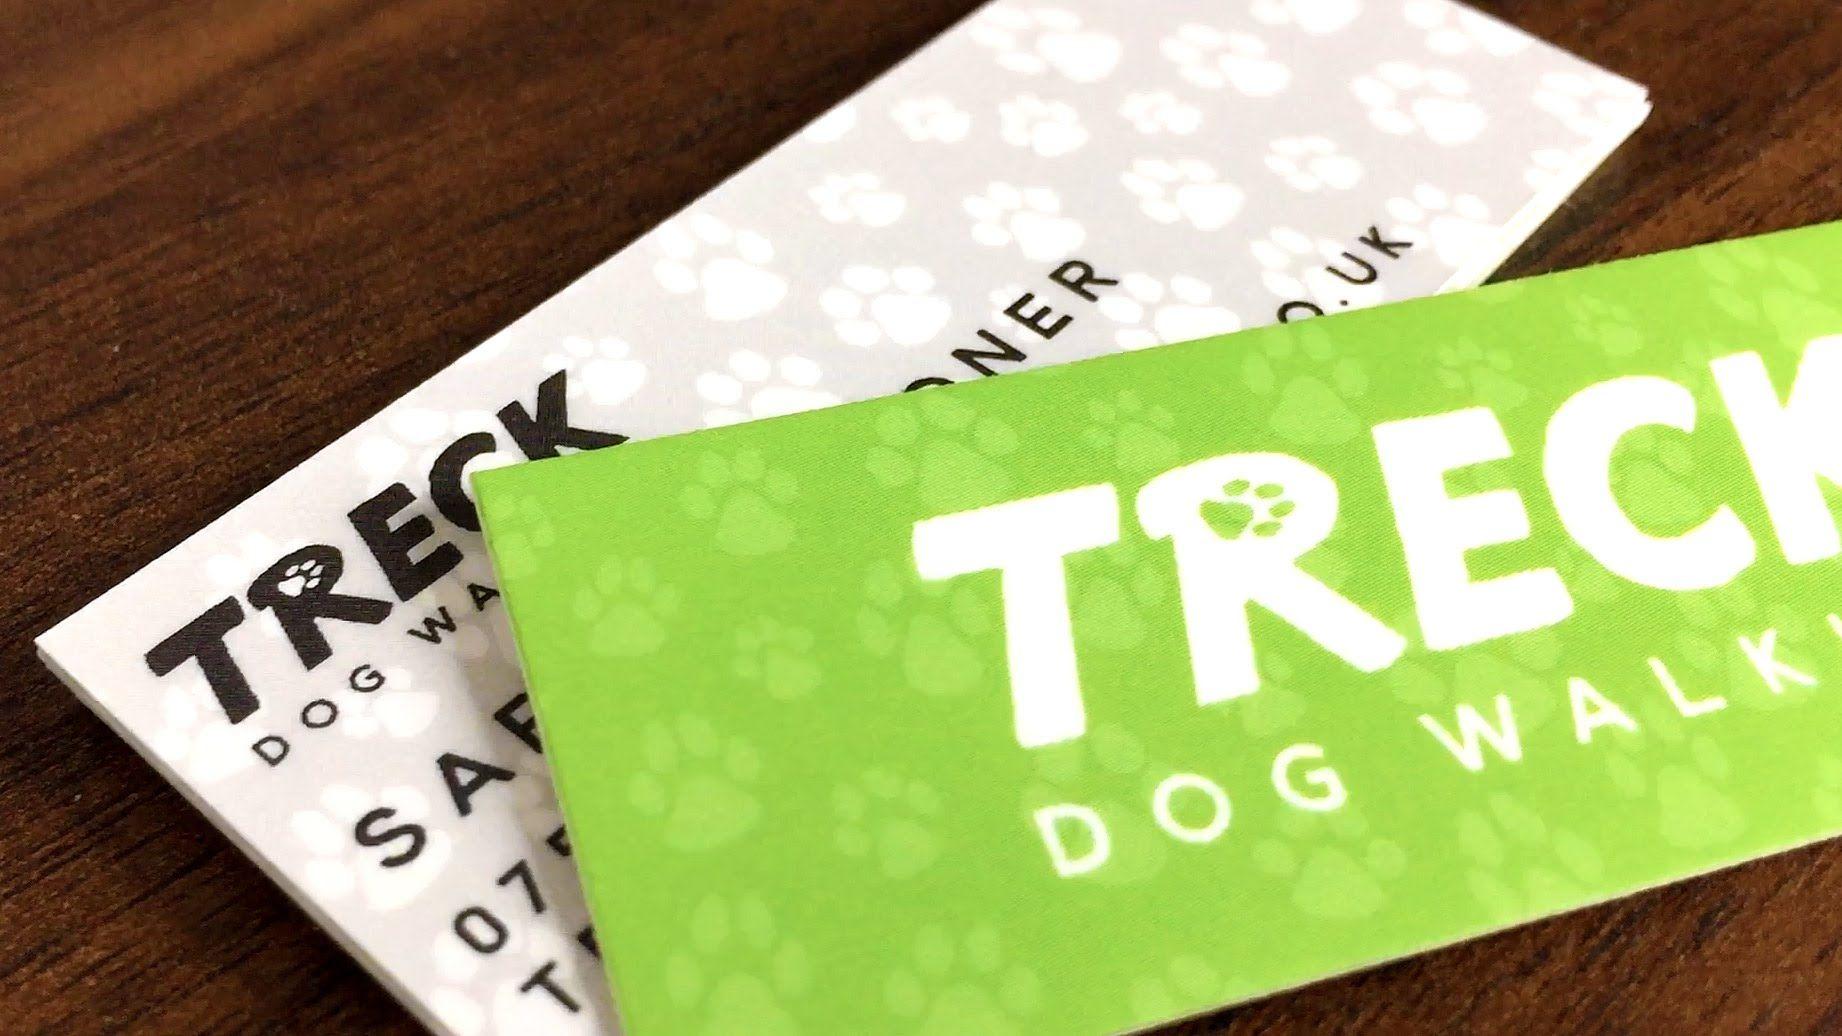 Illustrator tutorial business card print design process from start illustrator tutorial business card print design process from start to finish spoon graphics colourmoves